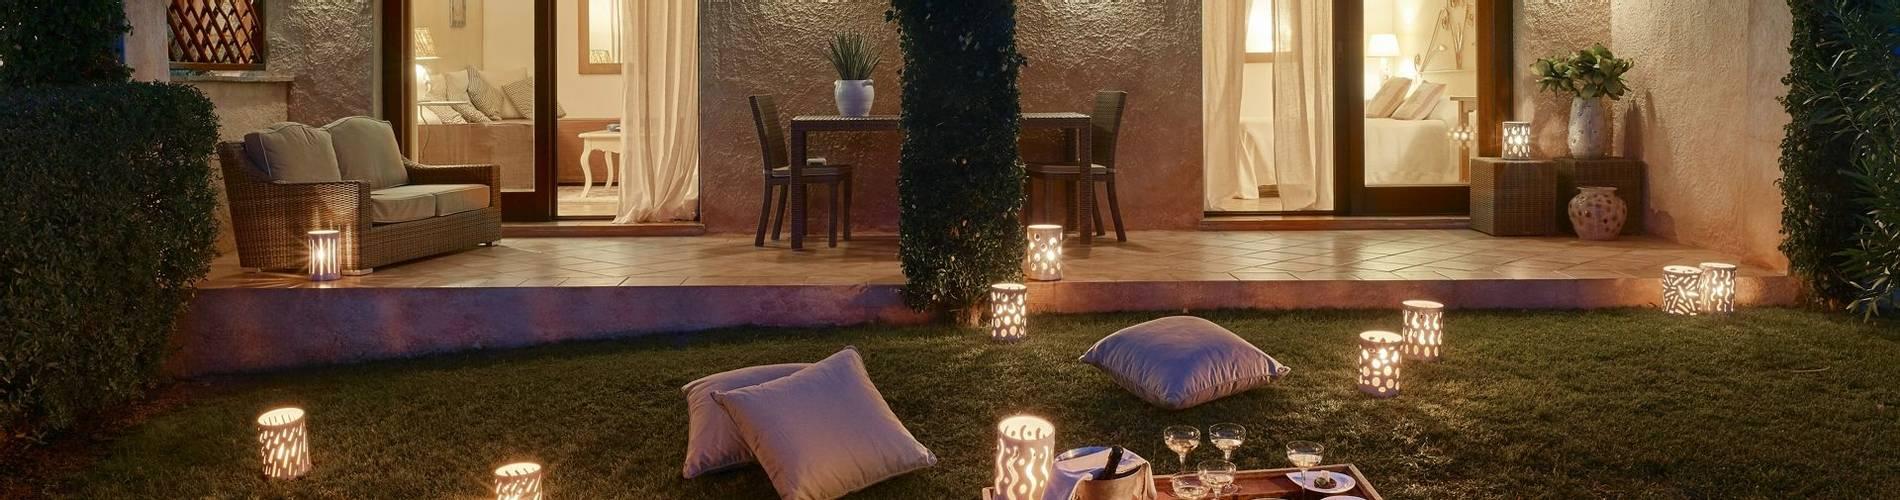 102 SUITE Hotel Villa del Golfo jpeg.jpg